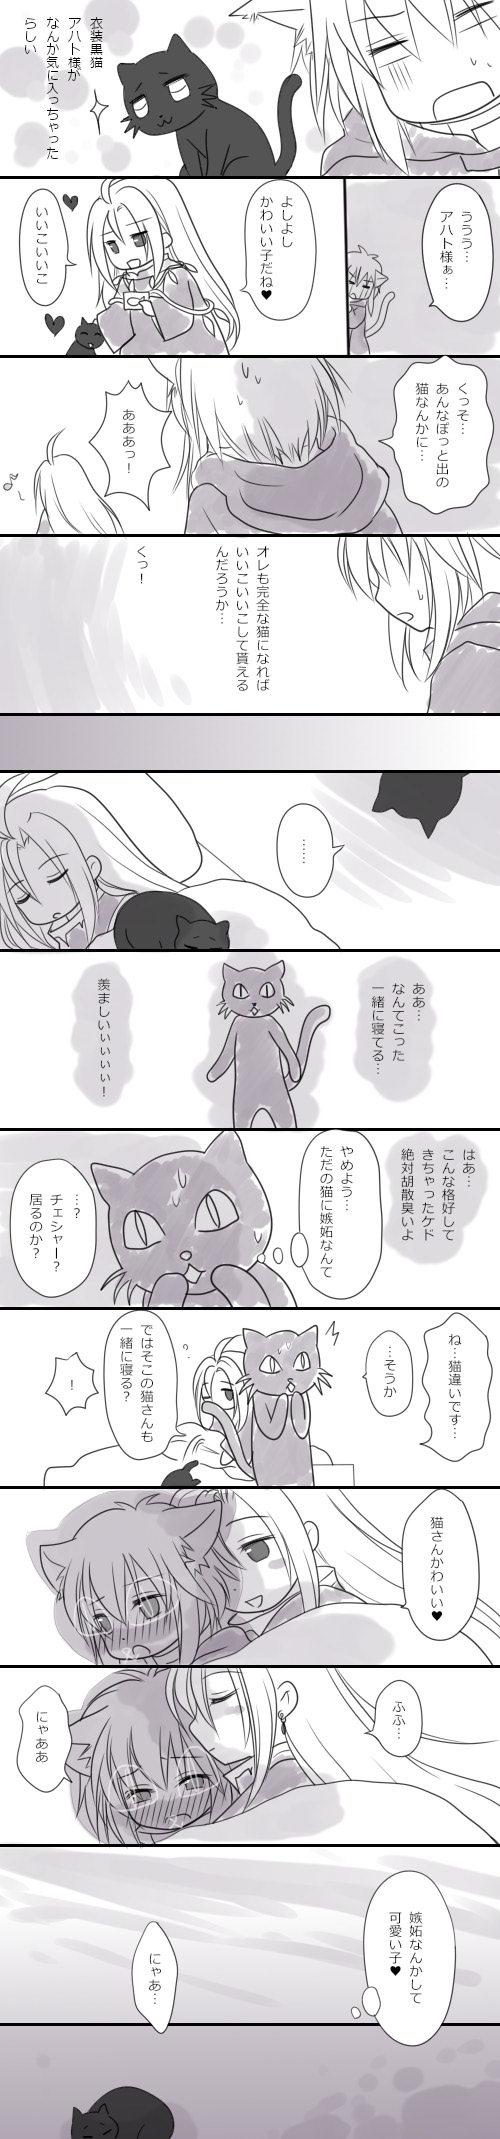 黒猫漫画。